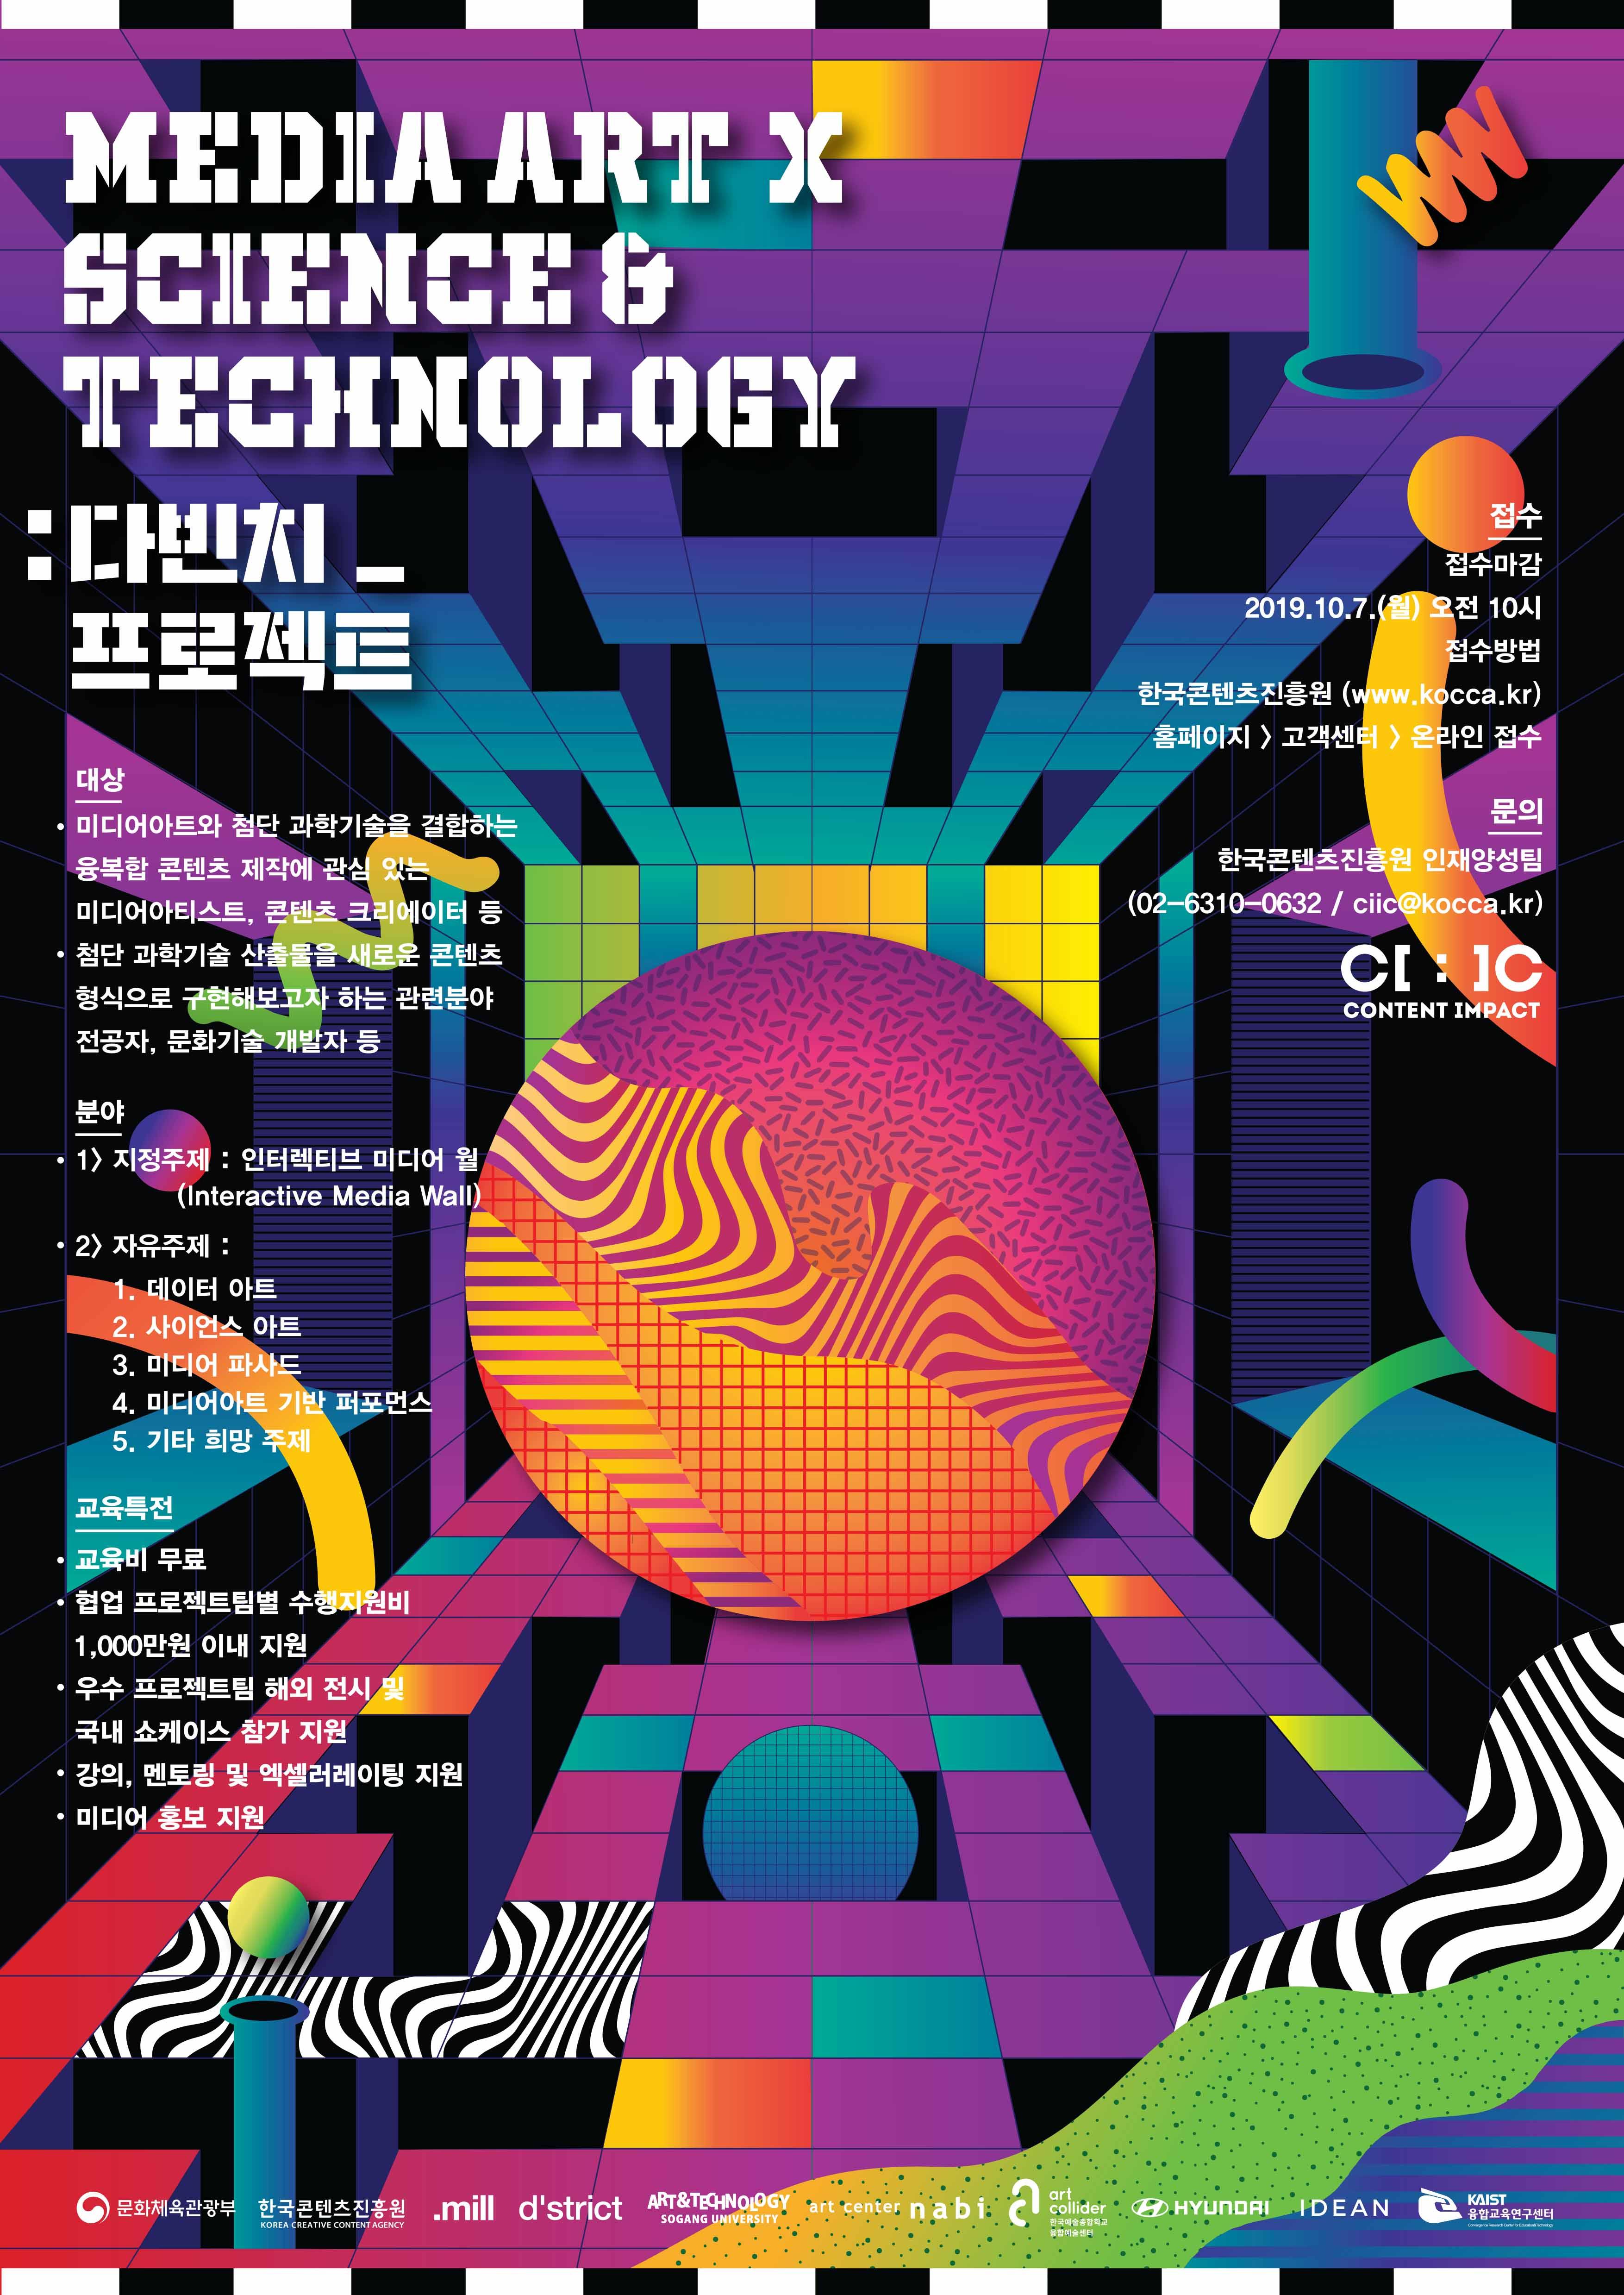 [KOCCA] Media art x Sci&Tech 다빈치 프로젝트 참가자 모집!